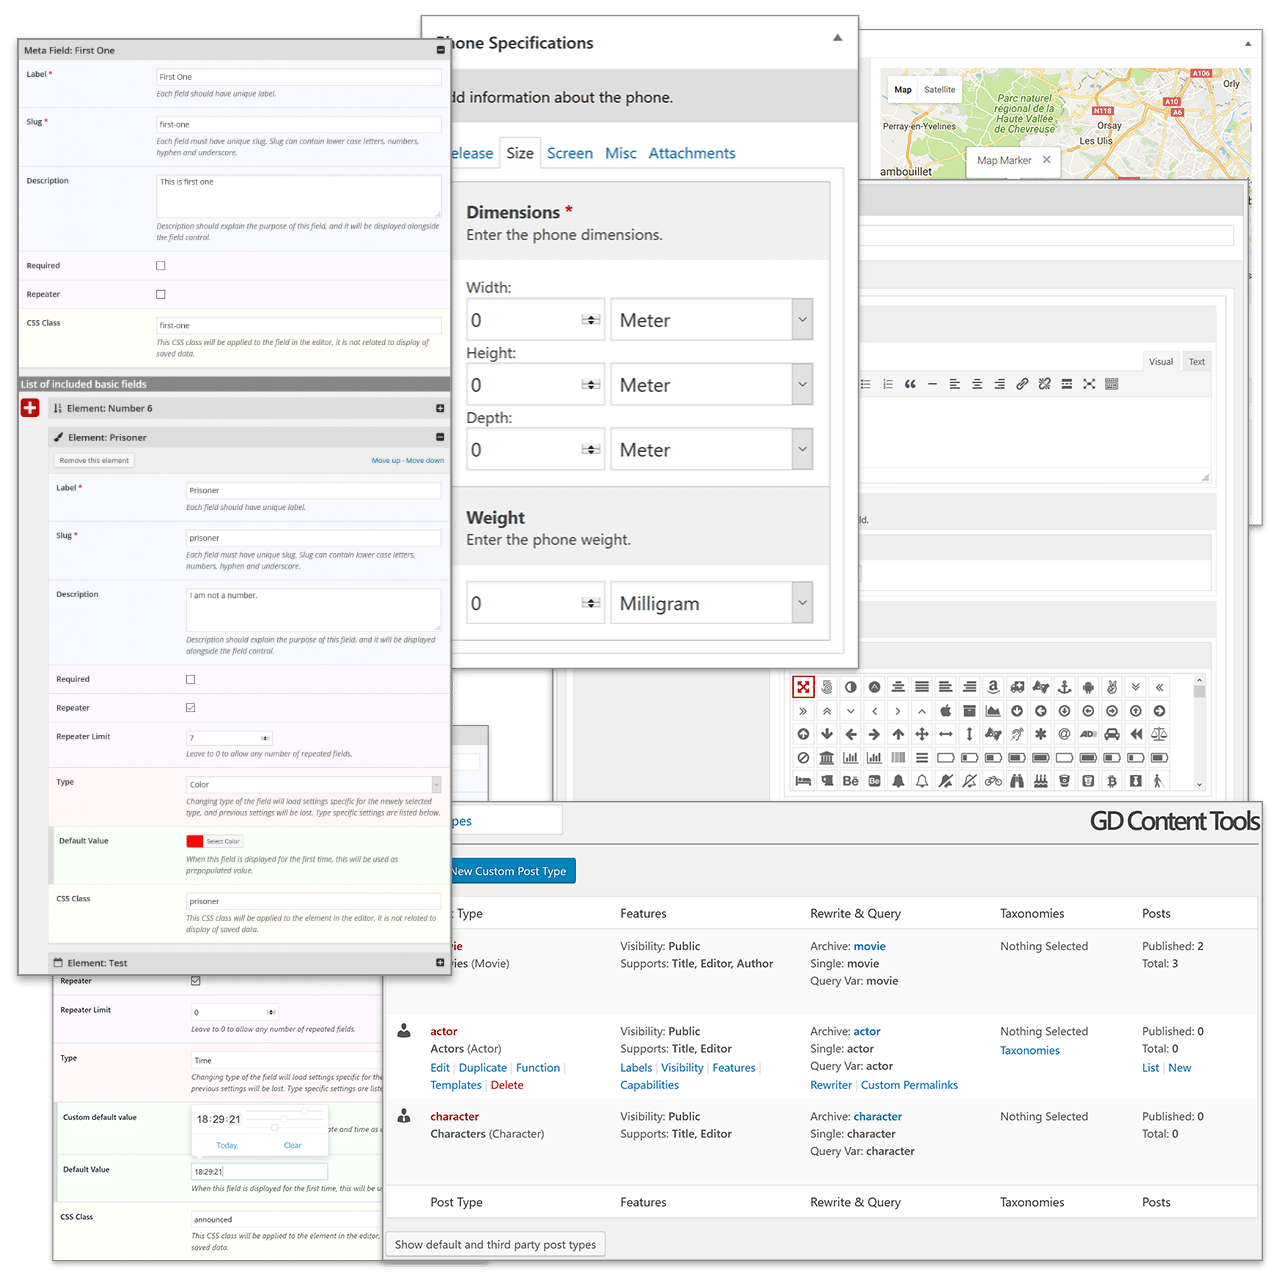 GD Content Tools Pro